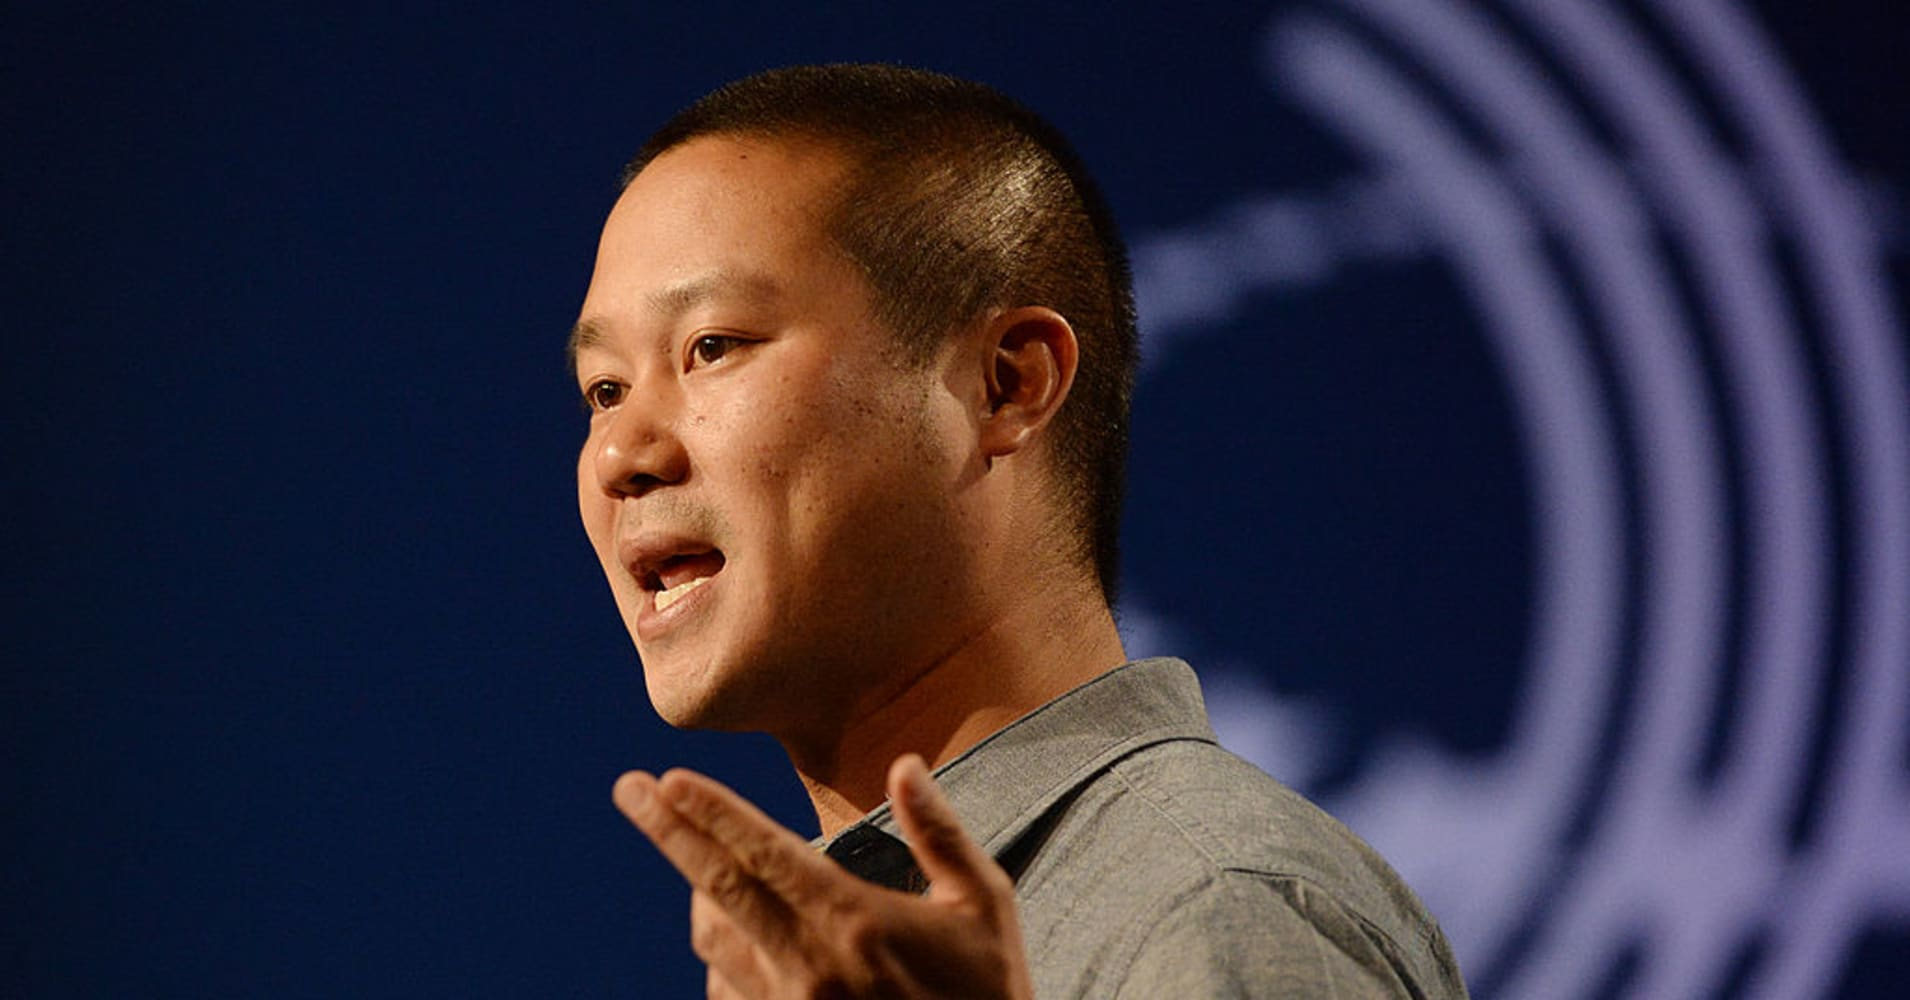 Tony Hsieh, CEO of Zappos